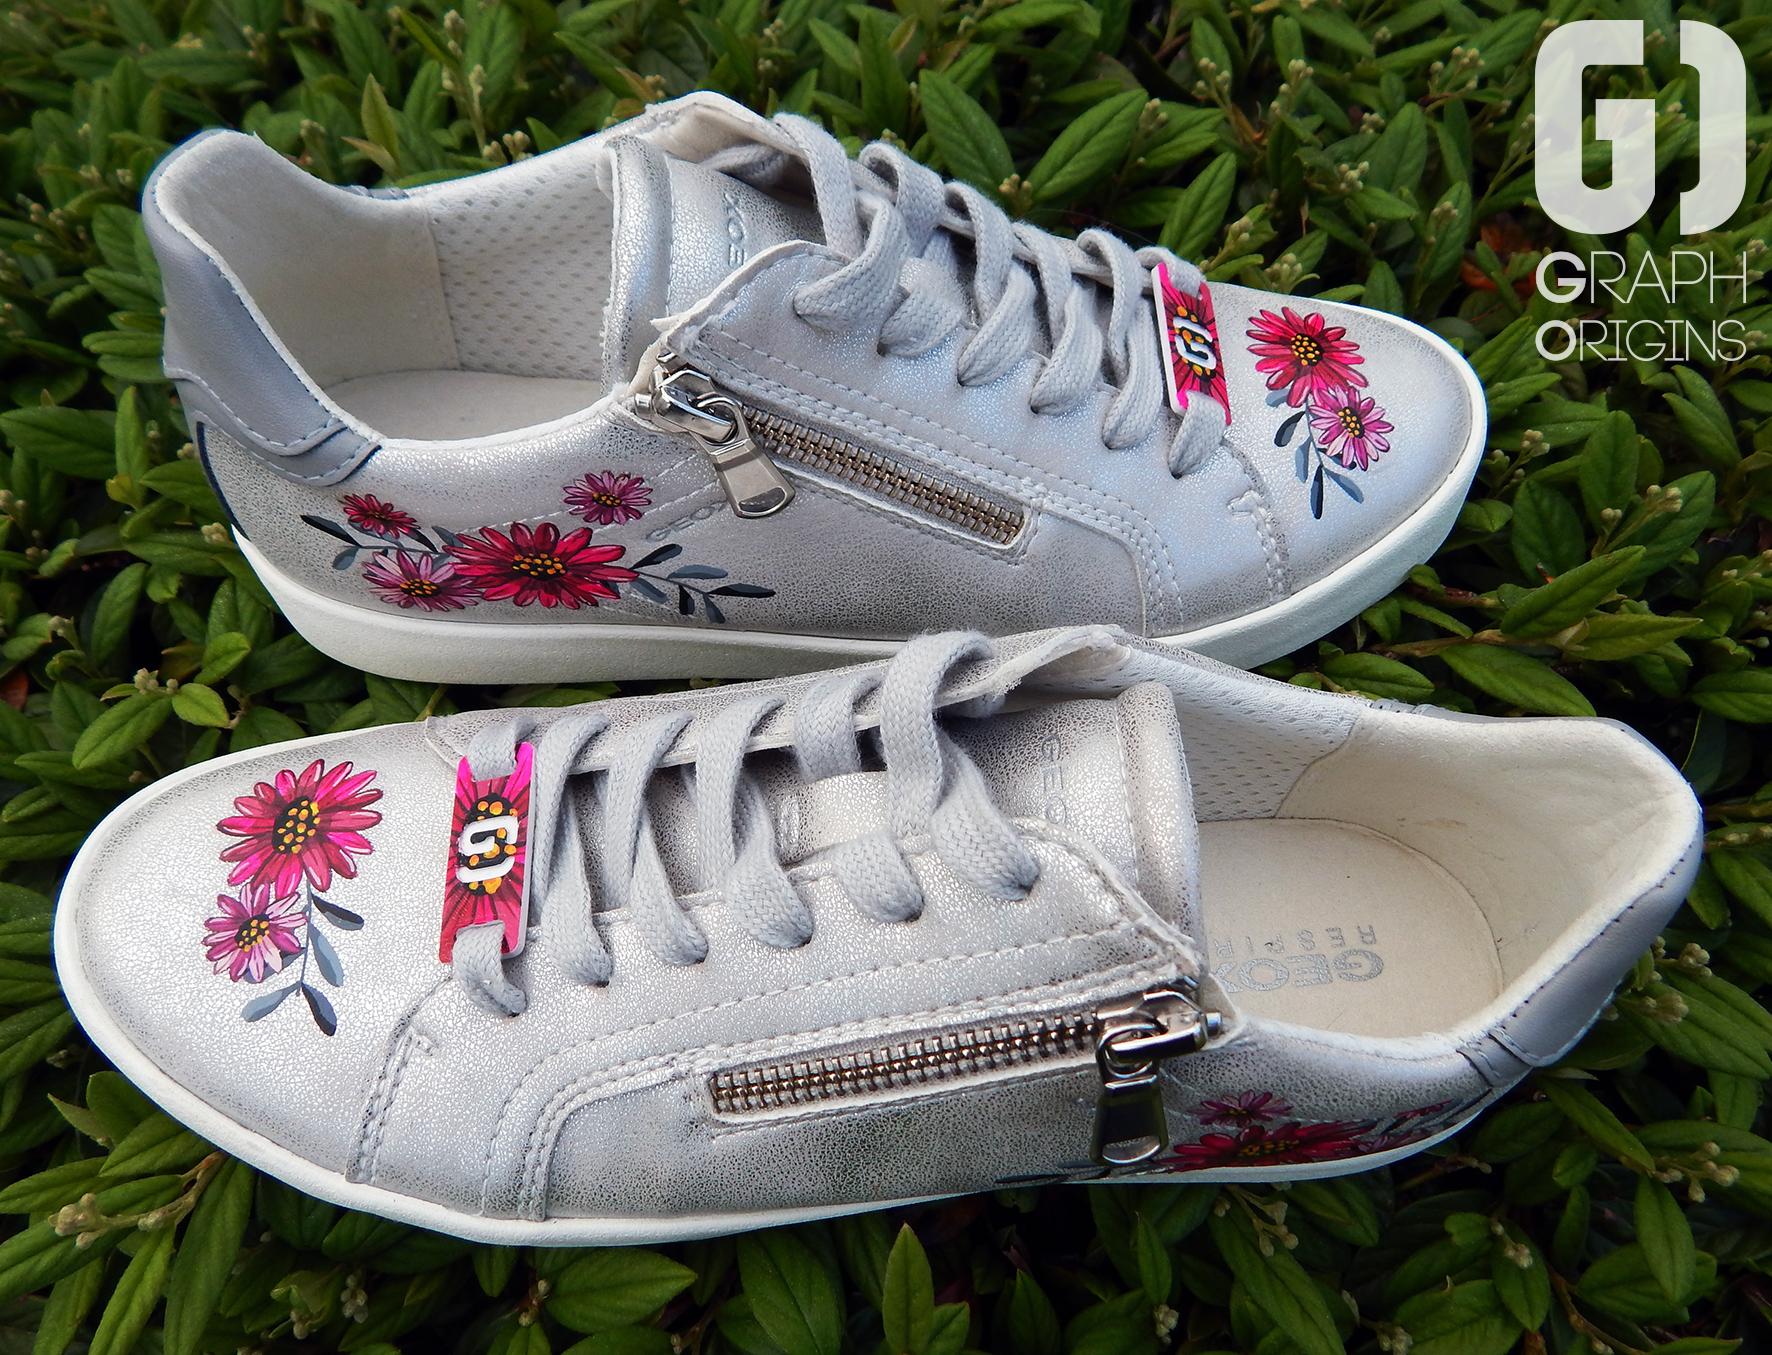 Customisation Chaussures Geox fleurs 2